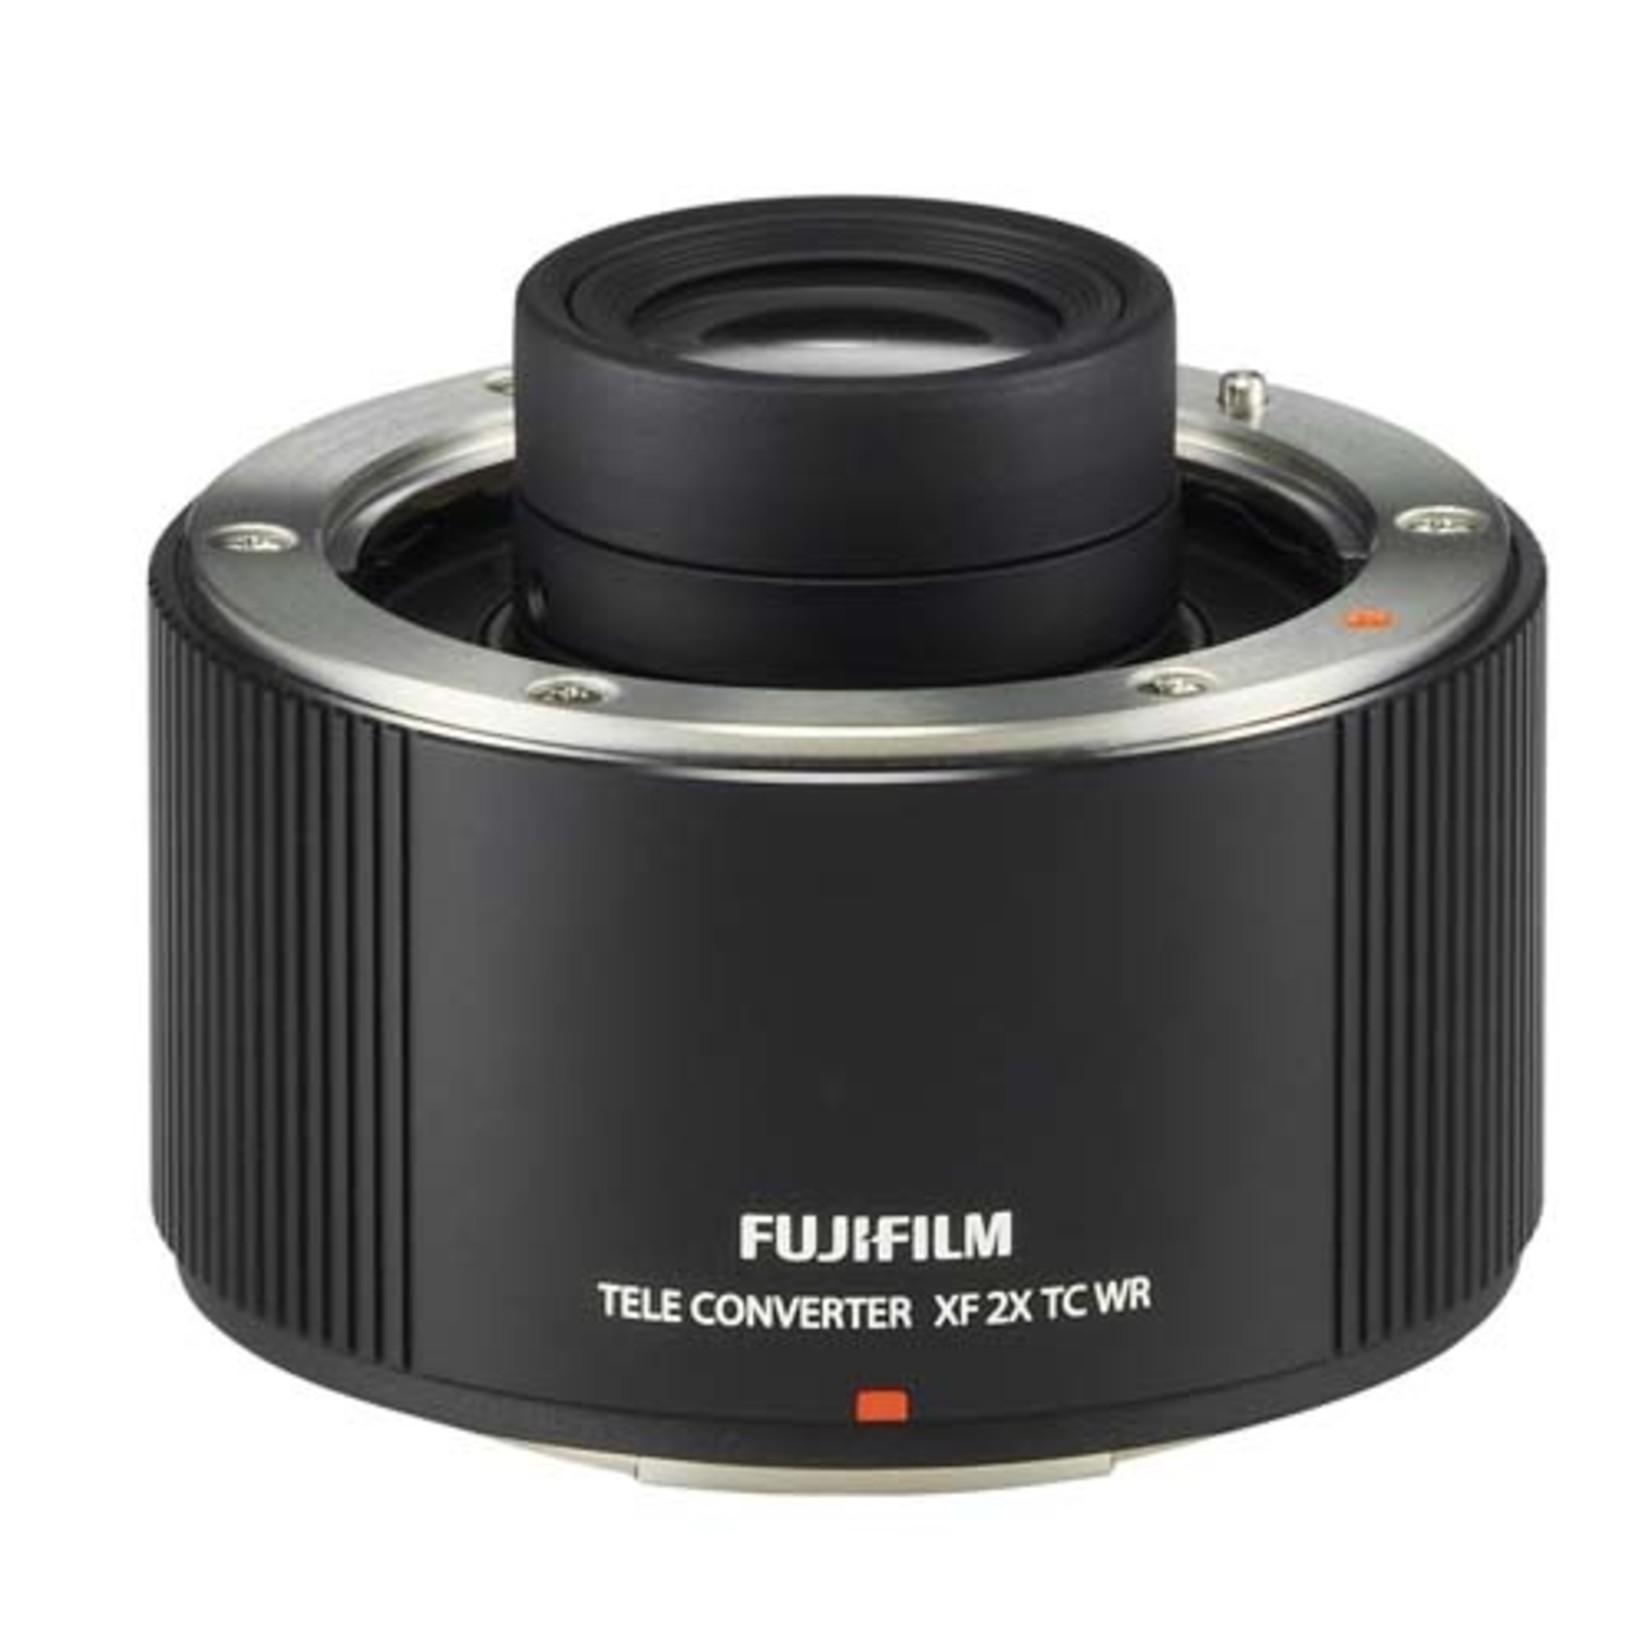 FujiFilm FujiFilm XF 2x TC WR Teleconverter